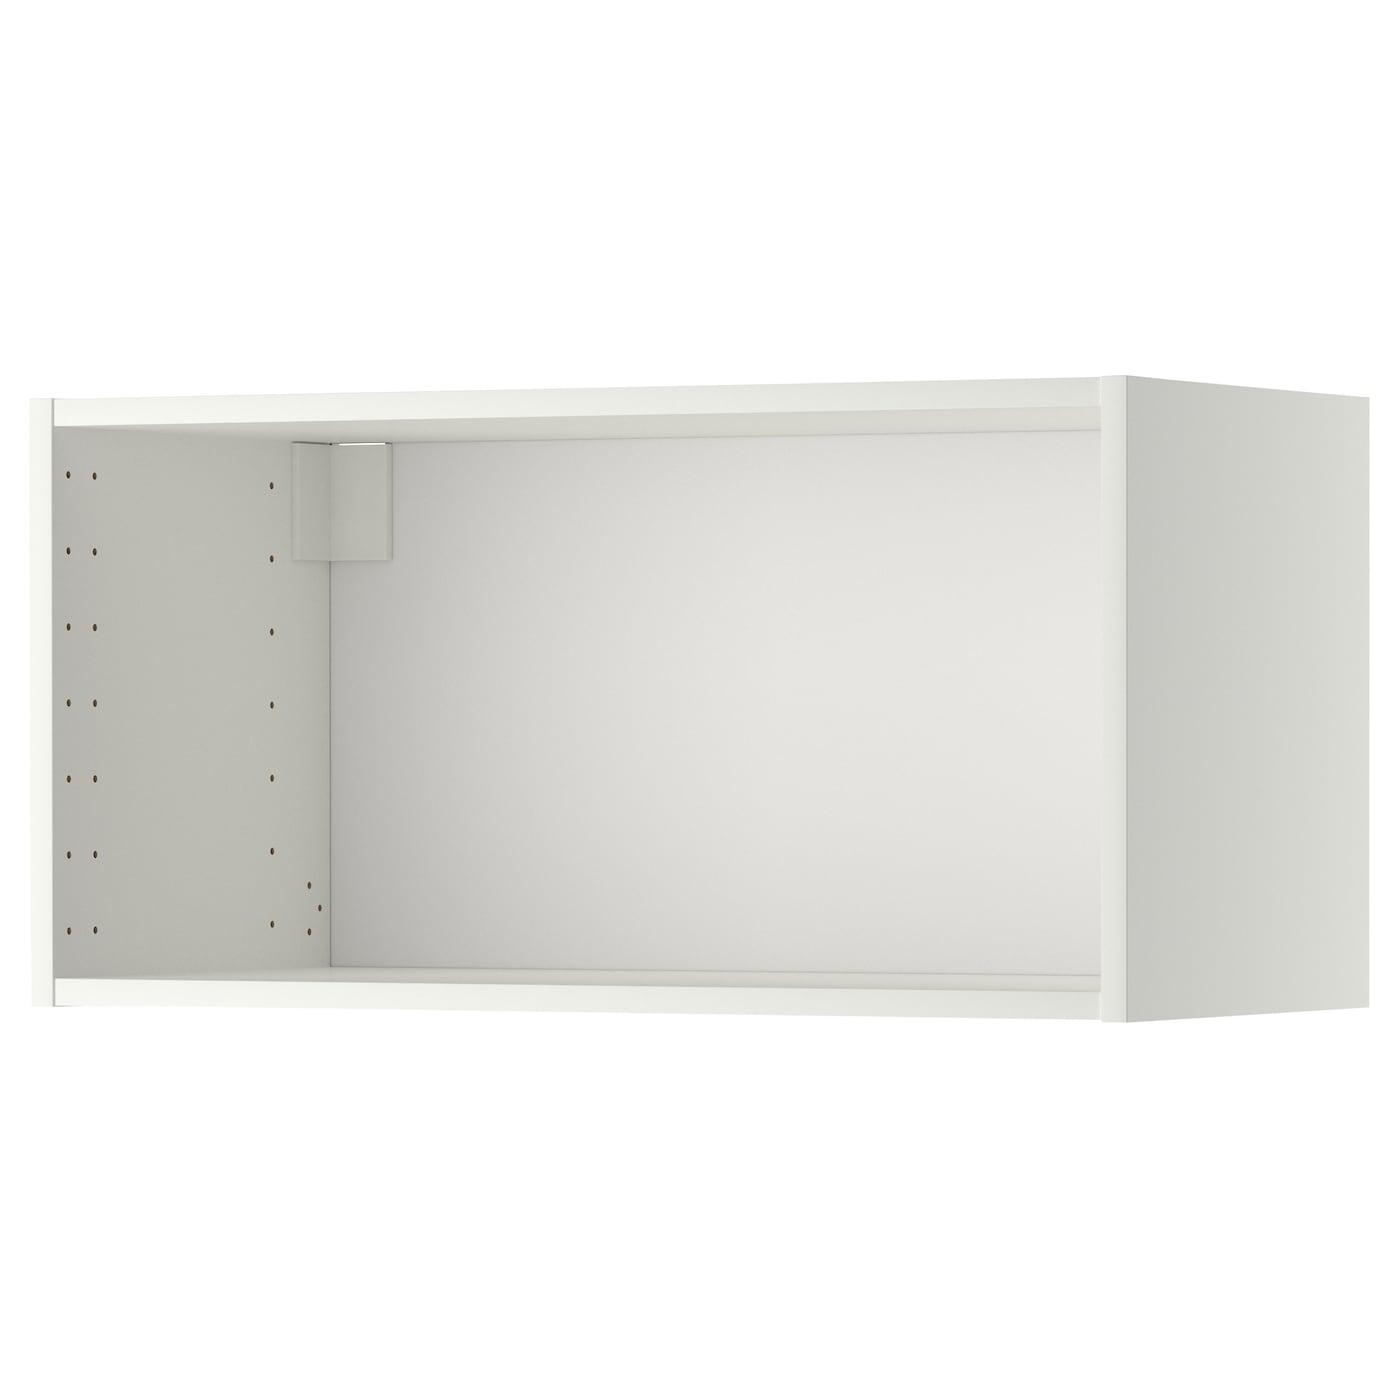 Metod Wall Cabinet Frame White Ikea